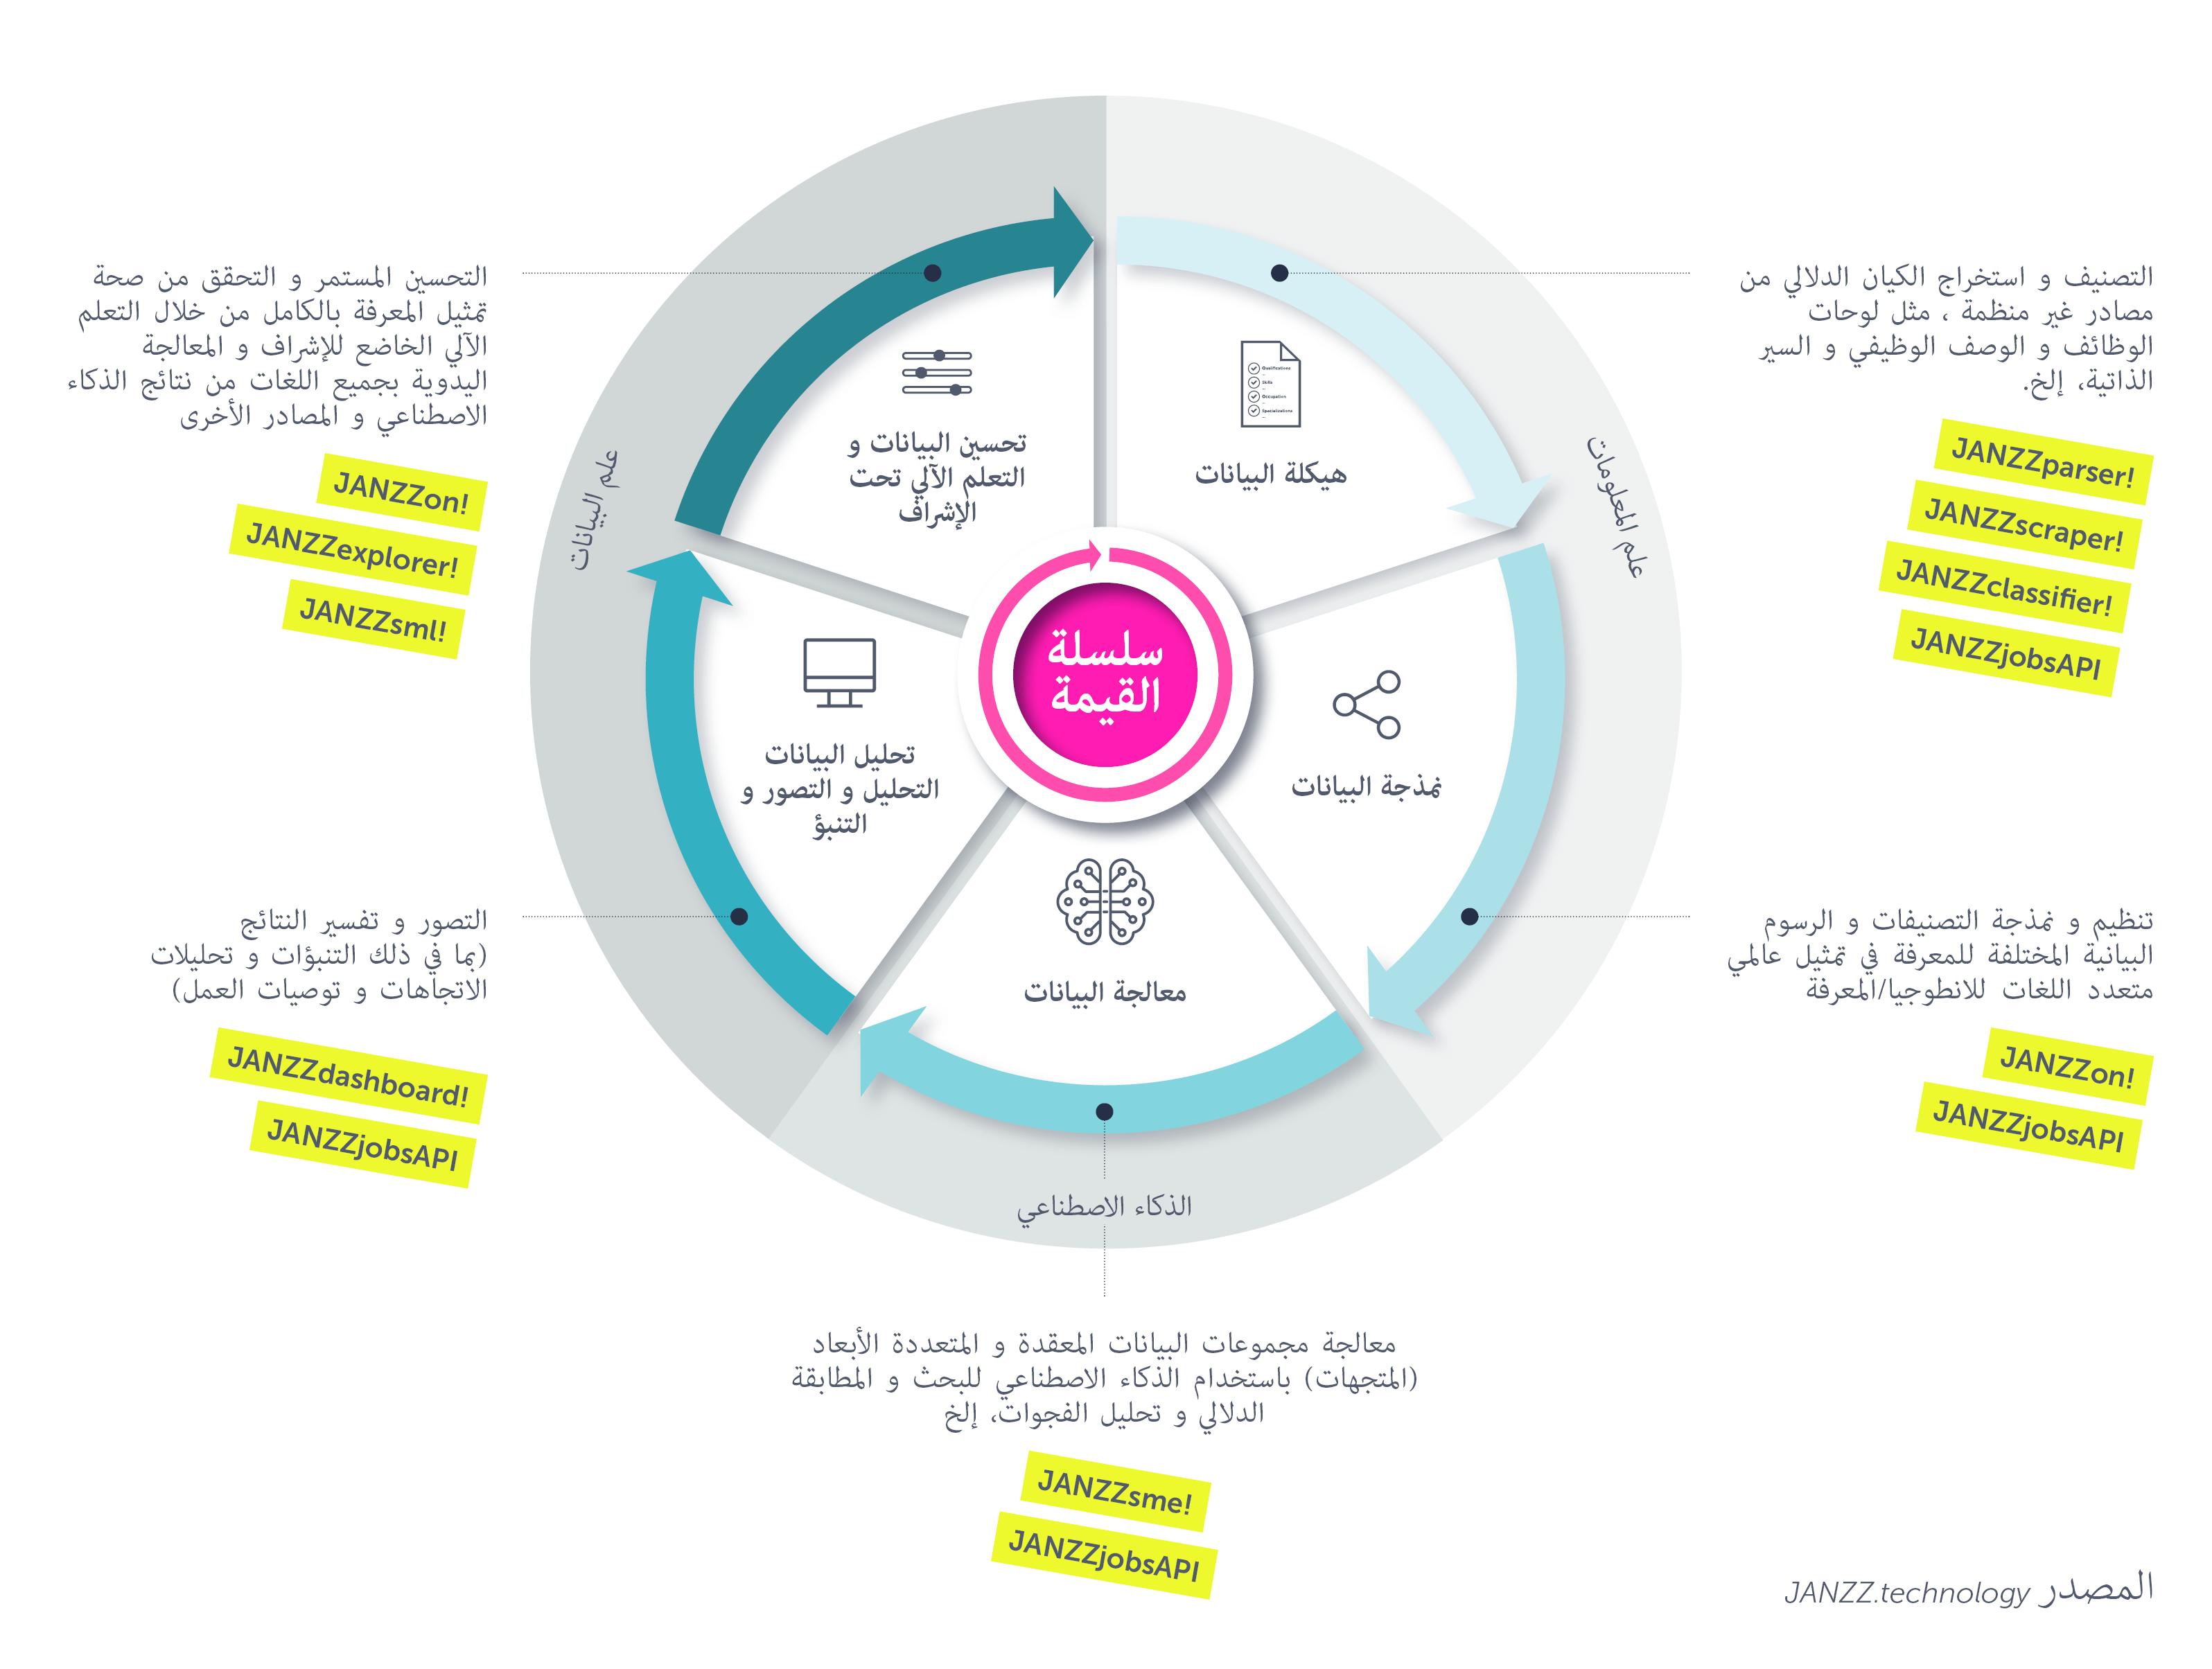 JANZZ.technology Value chain